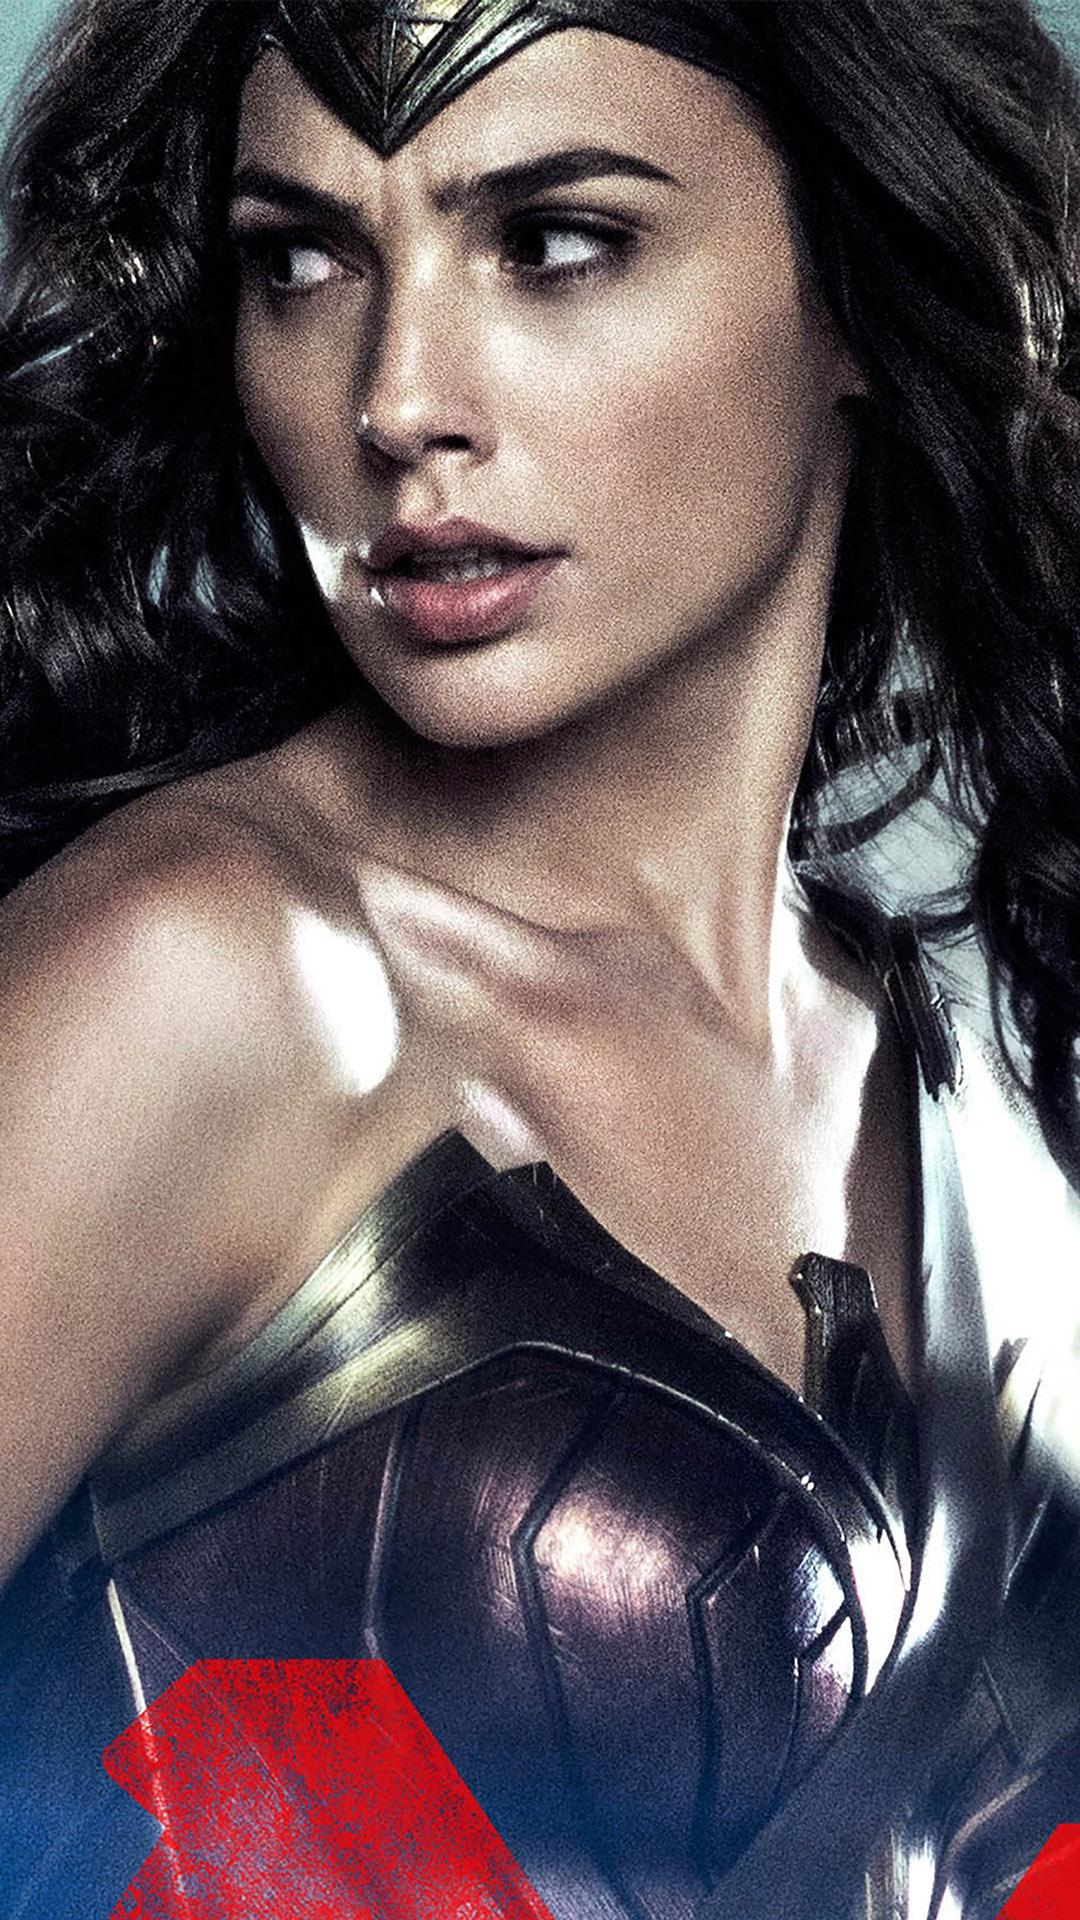 Batman-V-Superman-Wonder-Woman-Heroine-Movie-WallpapersByte-com-1080x1920